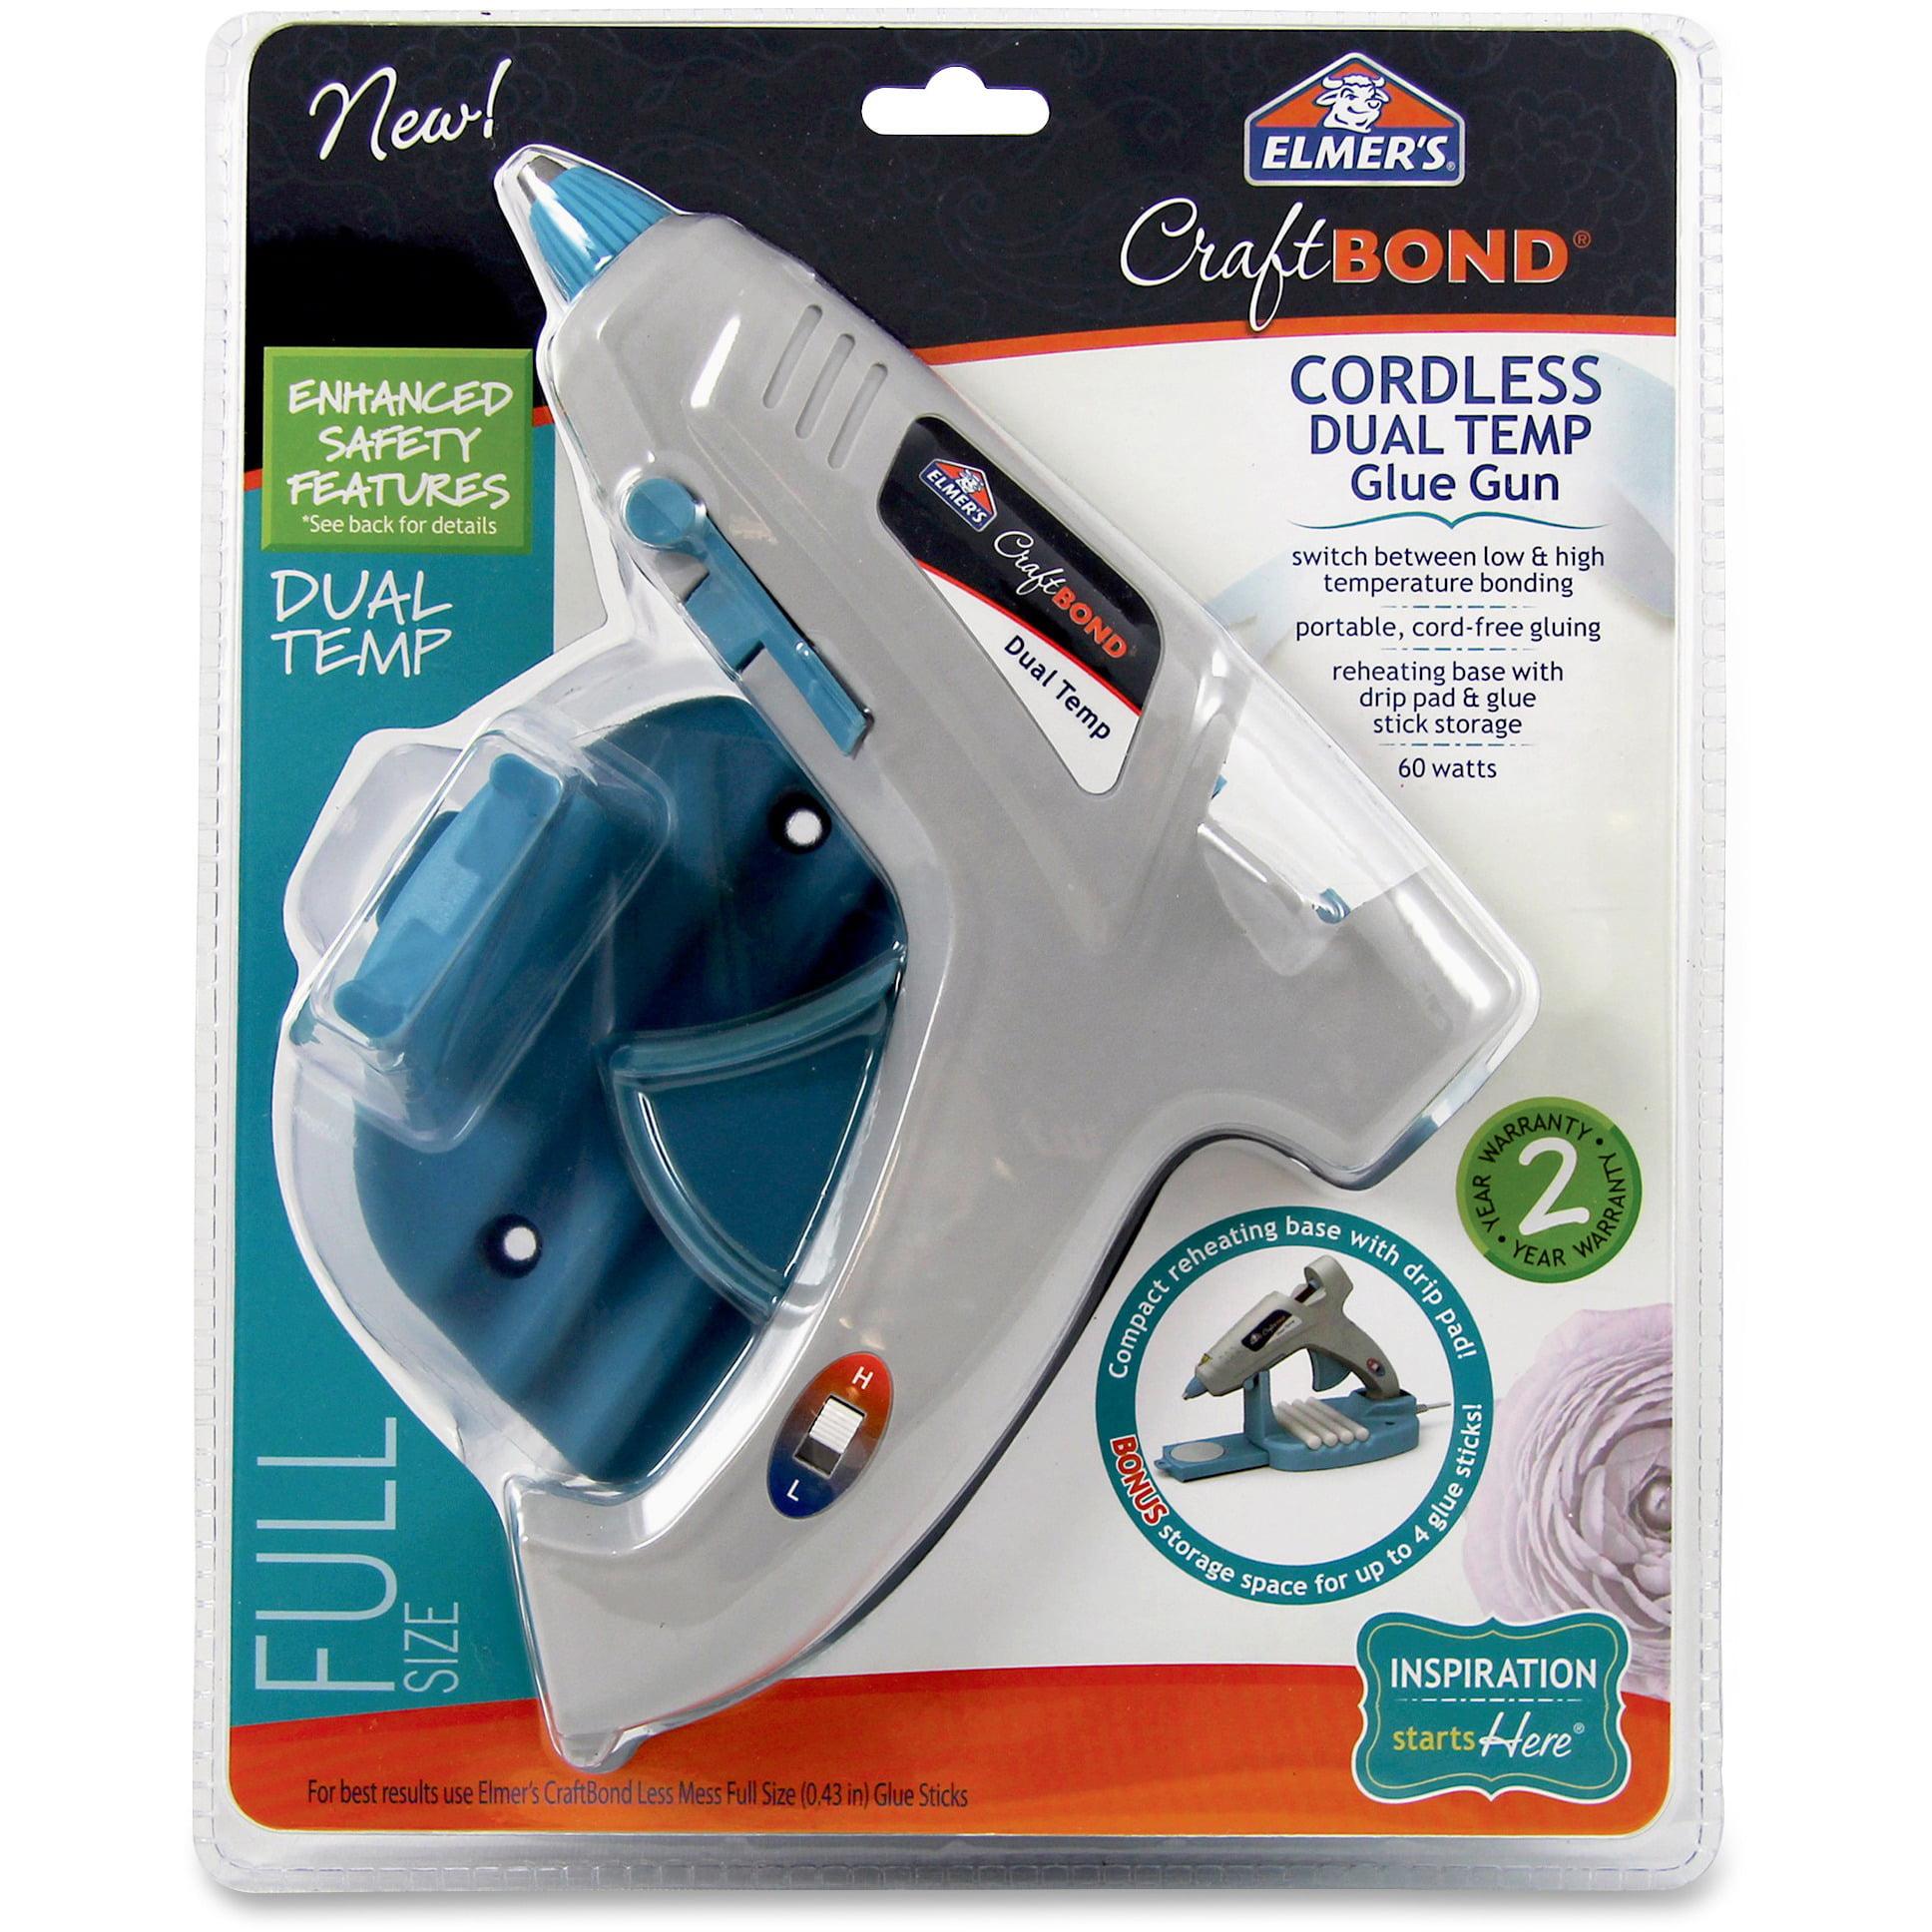 Elmer's CraftBond Cordless Dual Temp Glue Gun by Elmer's Products, Inc